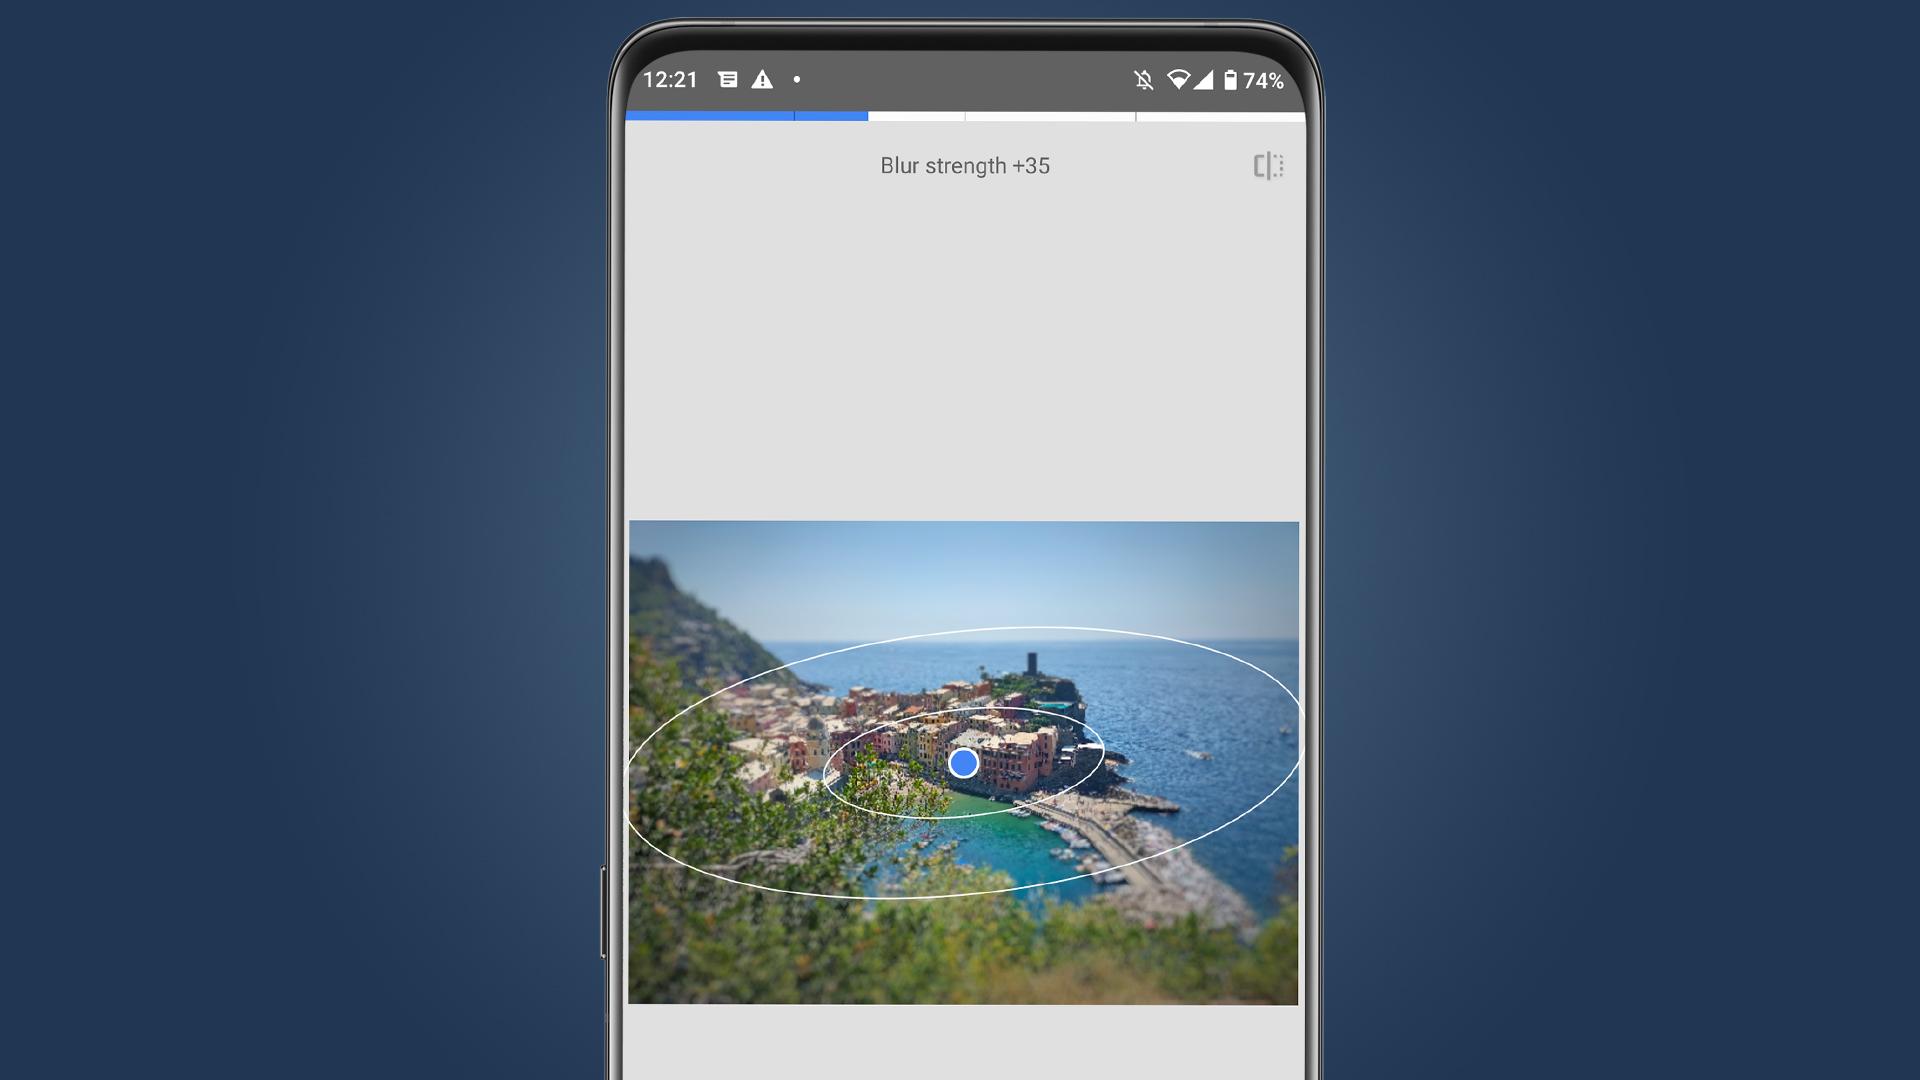 The tilt shift effect shown in the Snapseed app